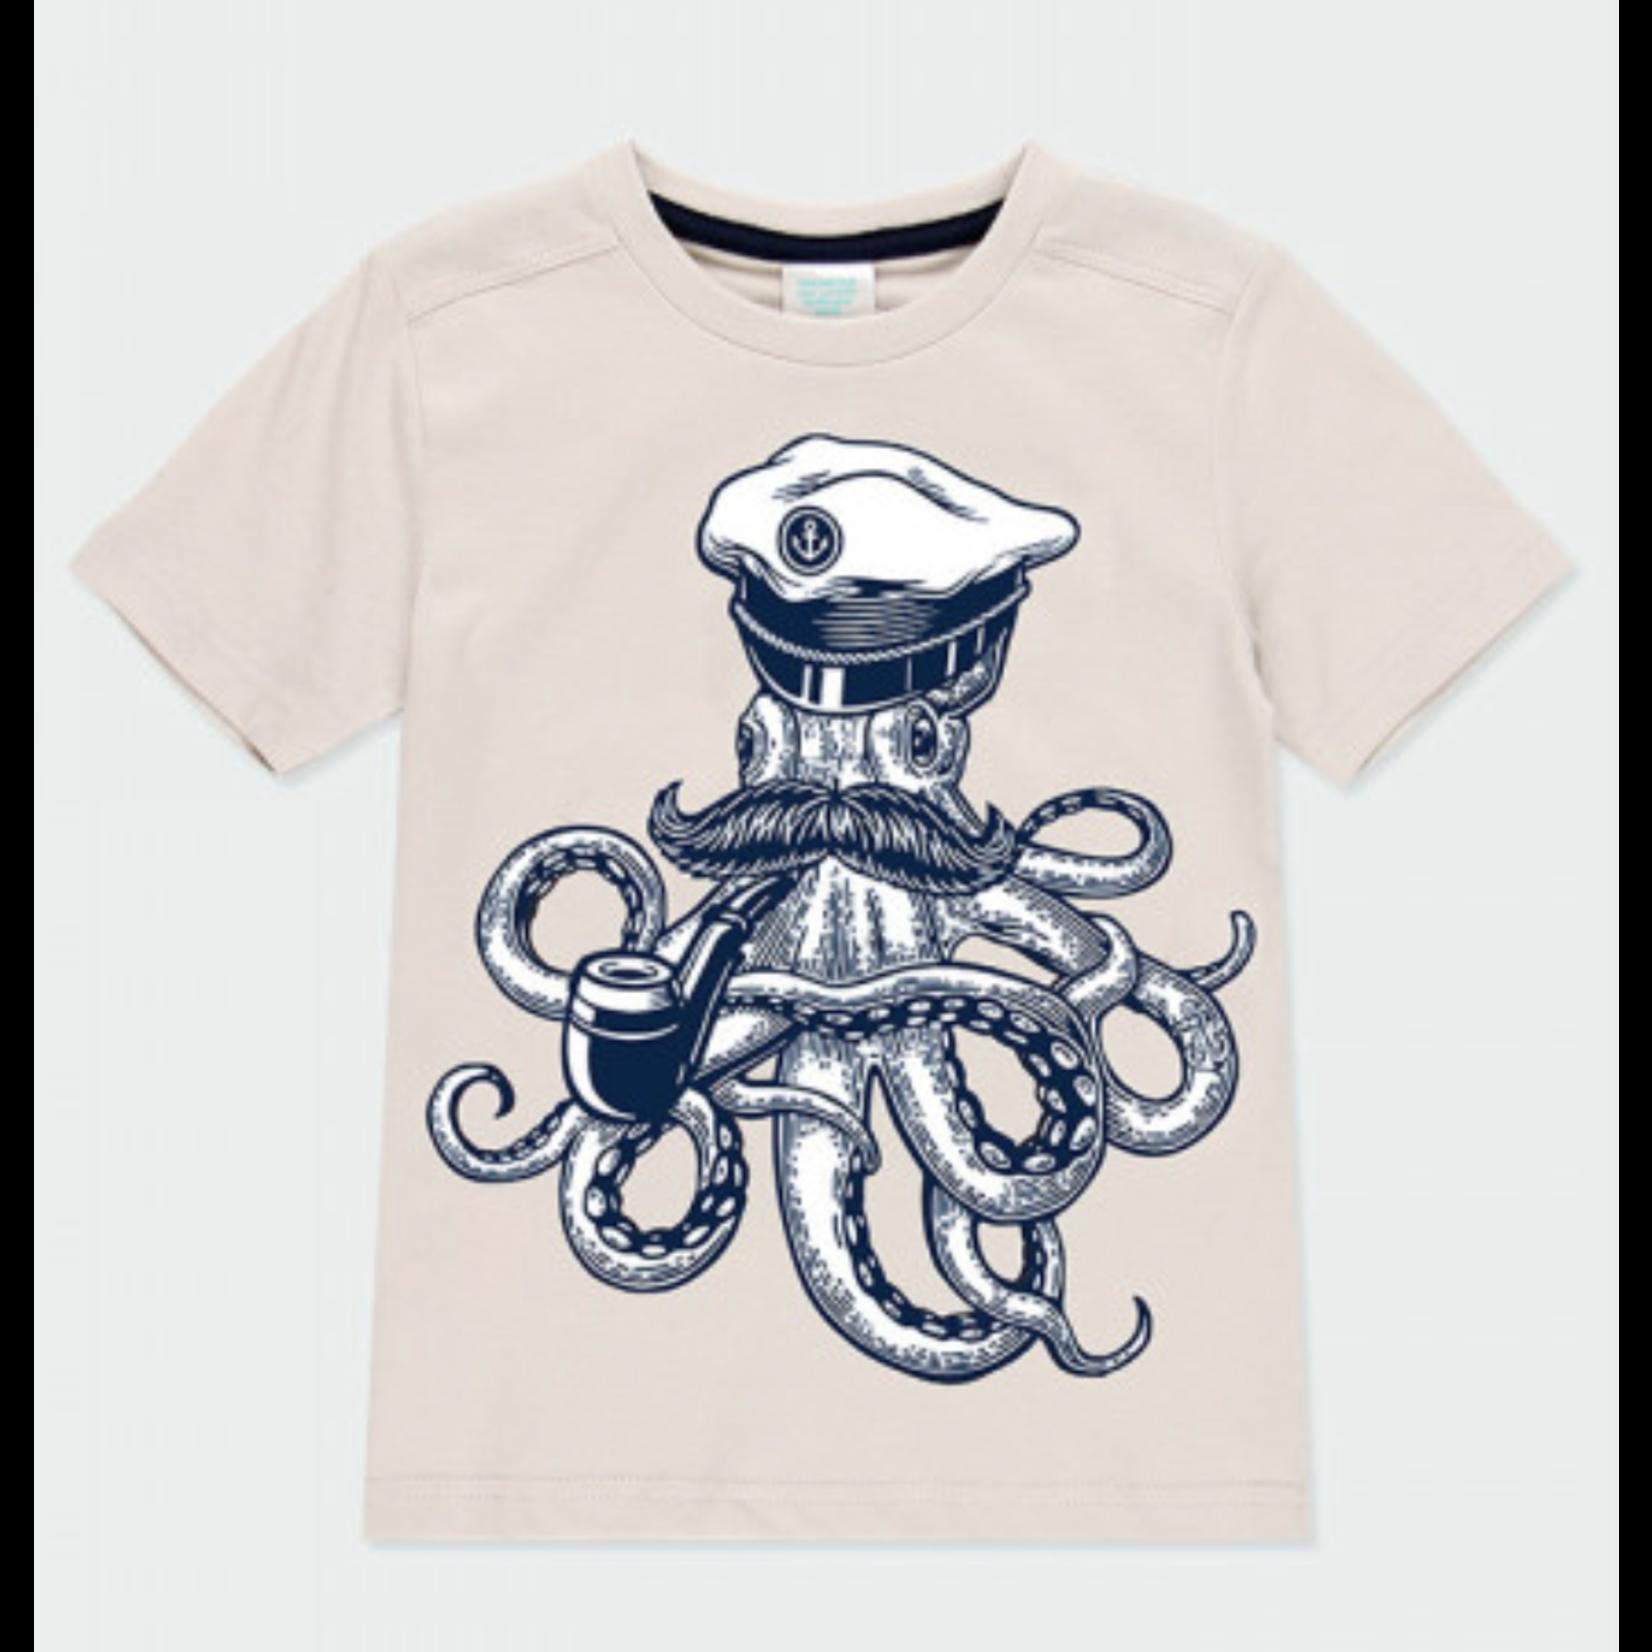 Bóboli Knit t-Shirt for boy